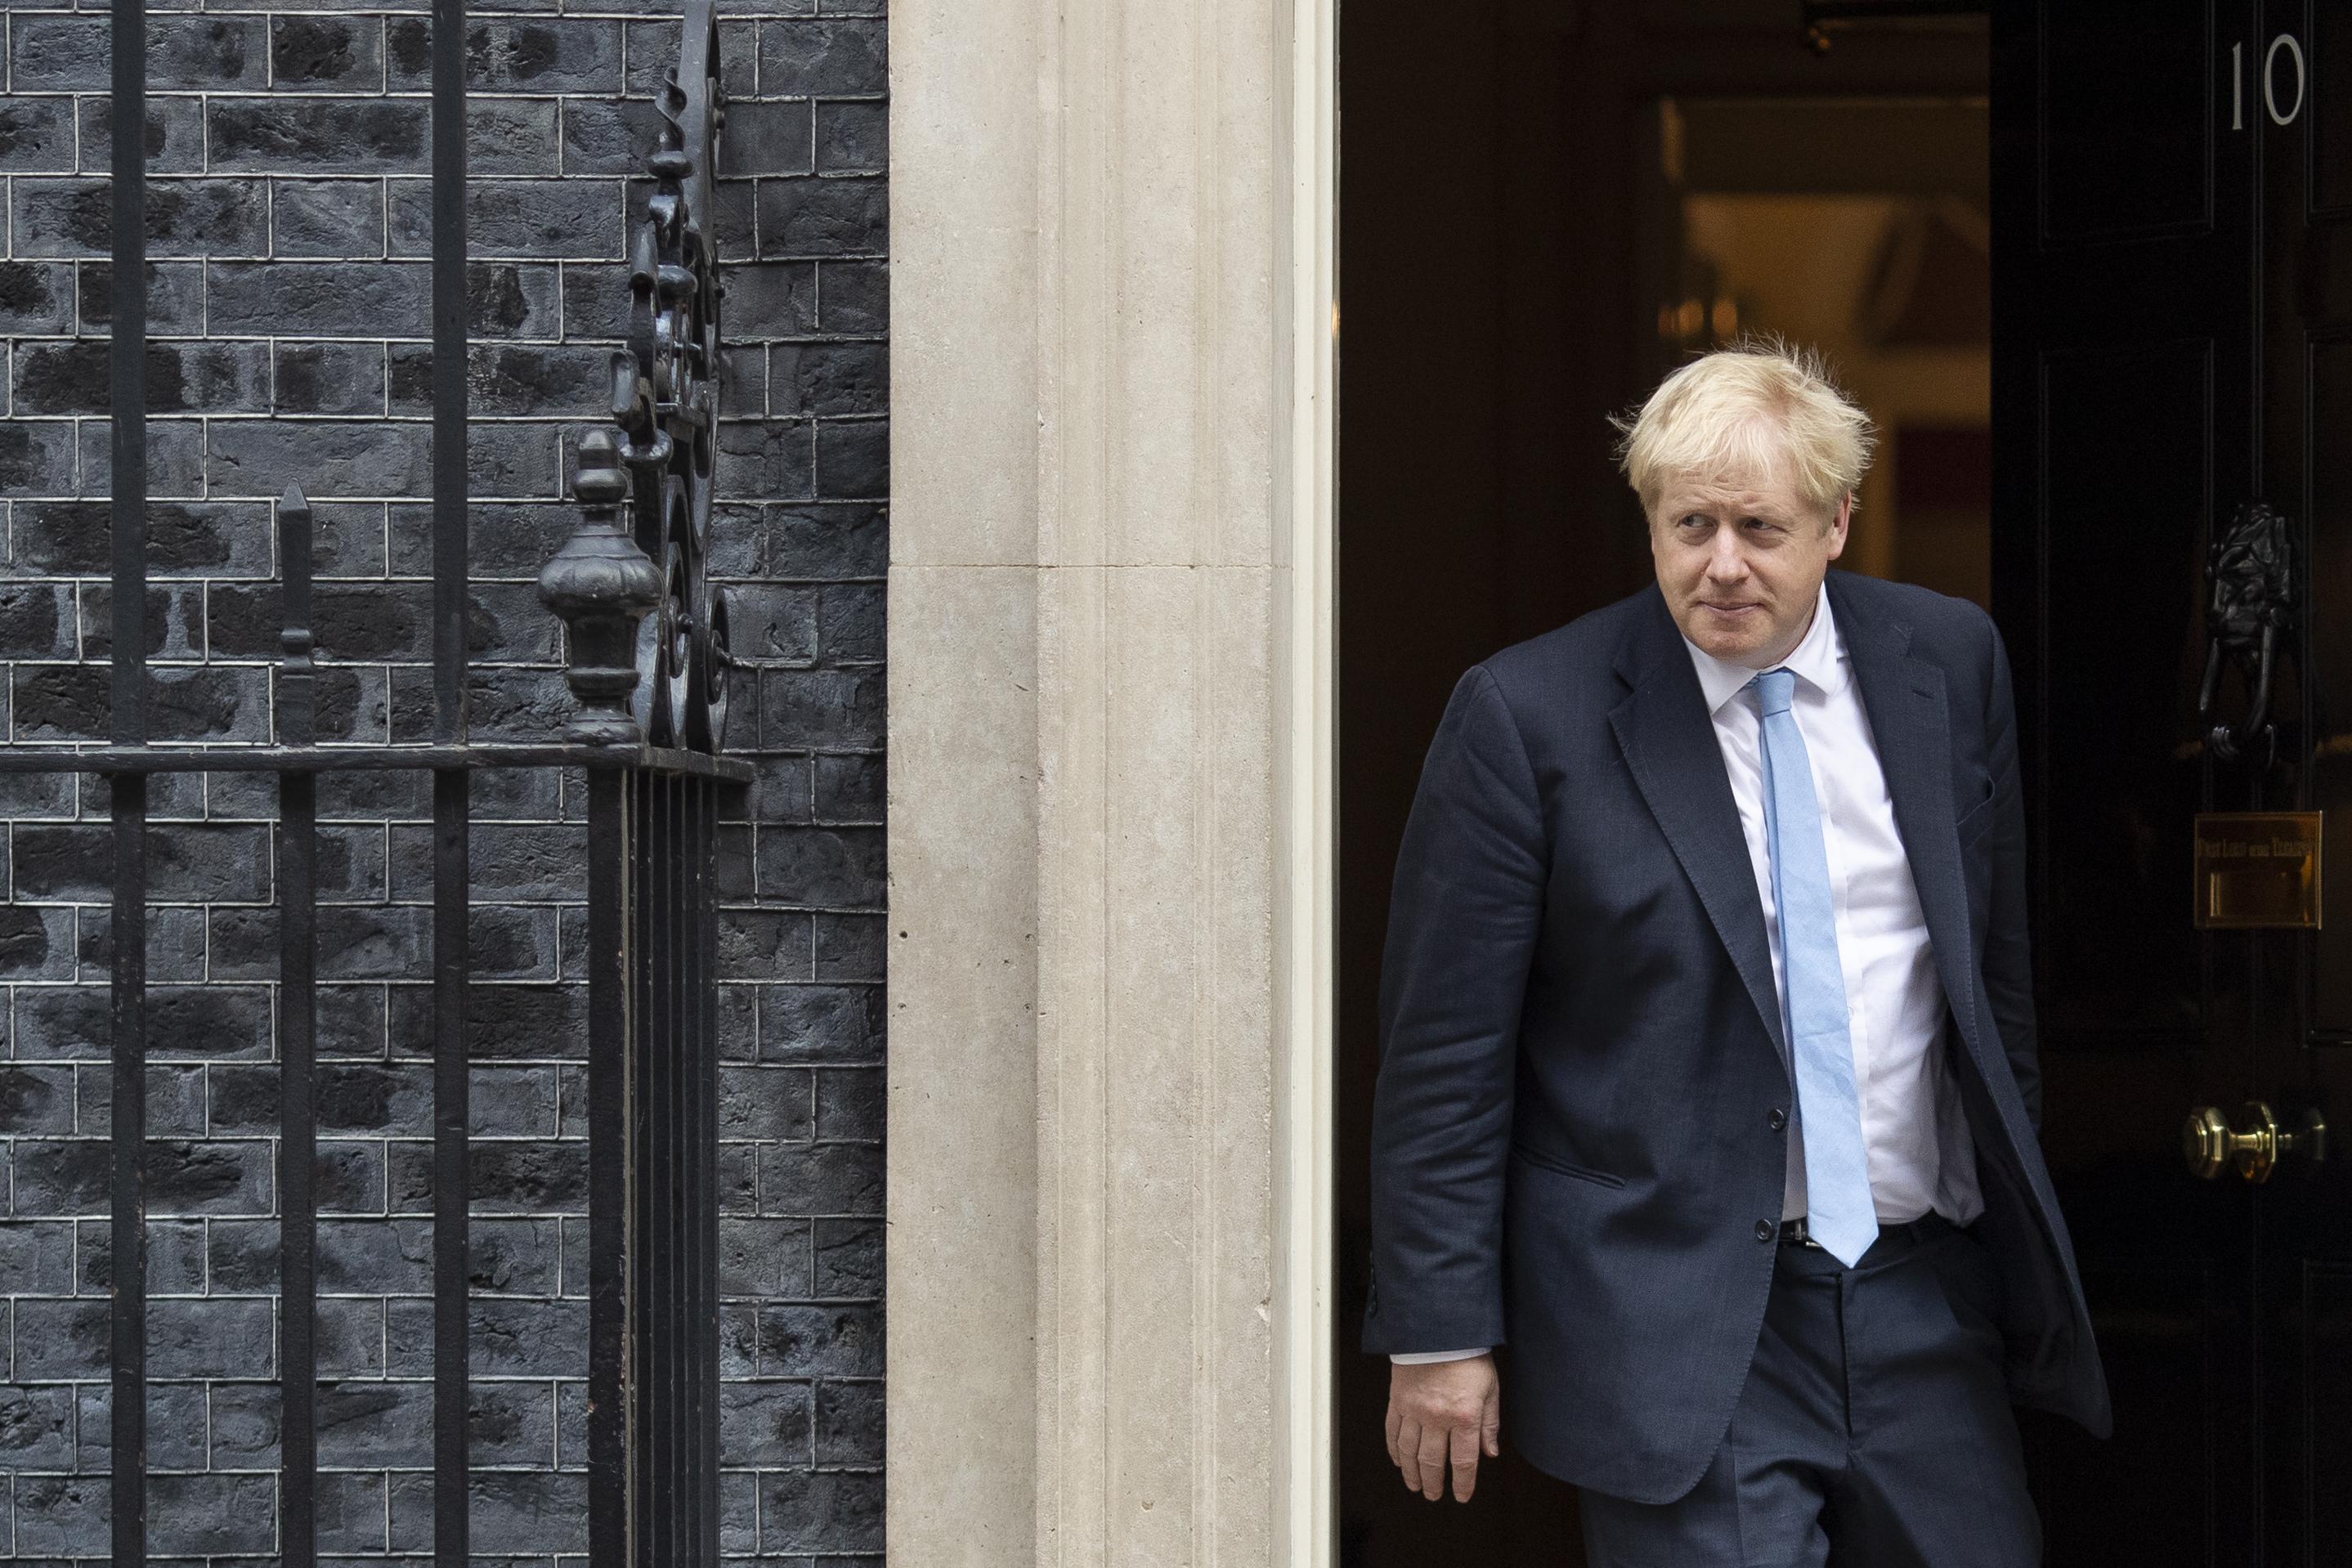 UK Prime Minister Boris Johnson at 10 Downing Street on Tuesday.